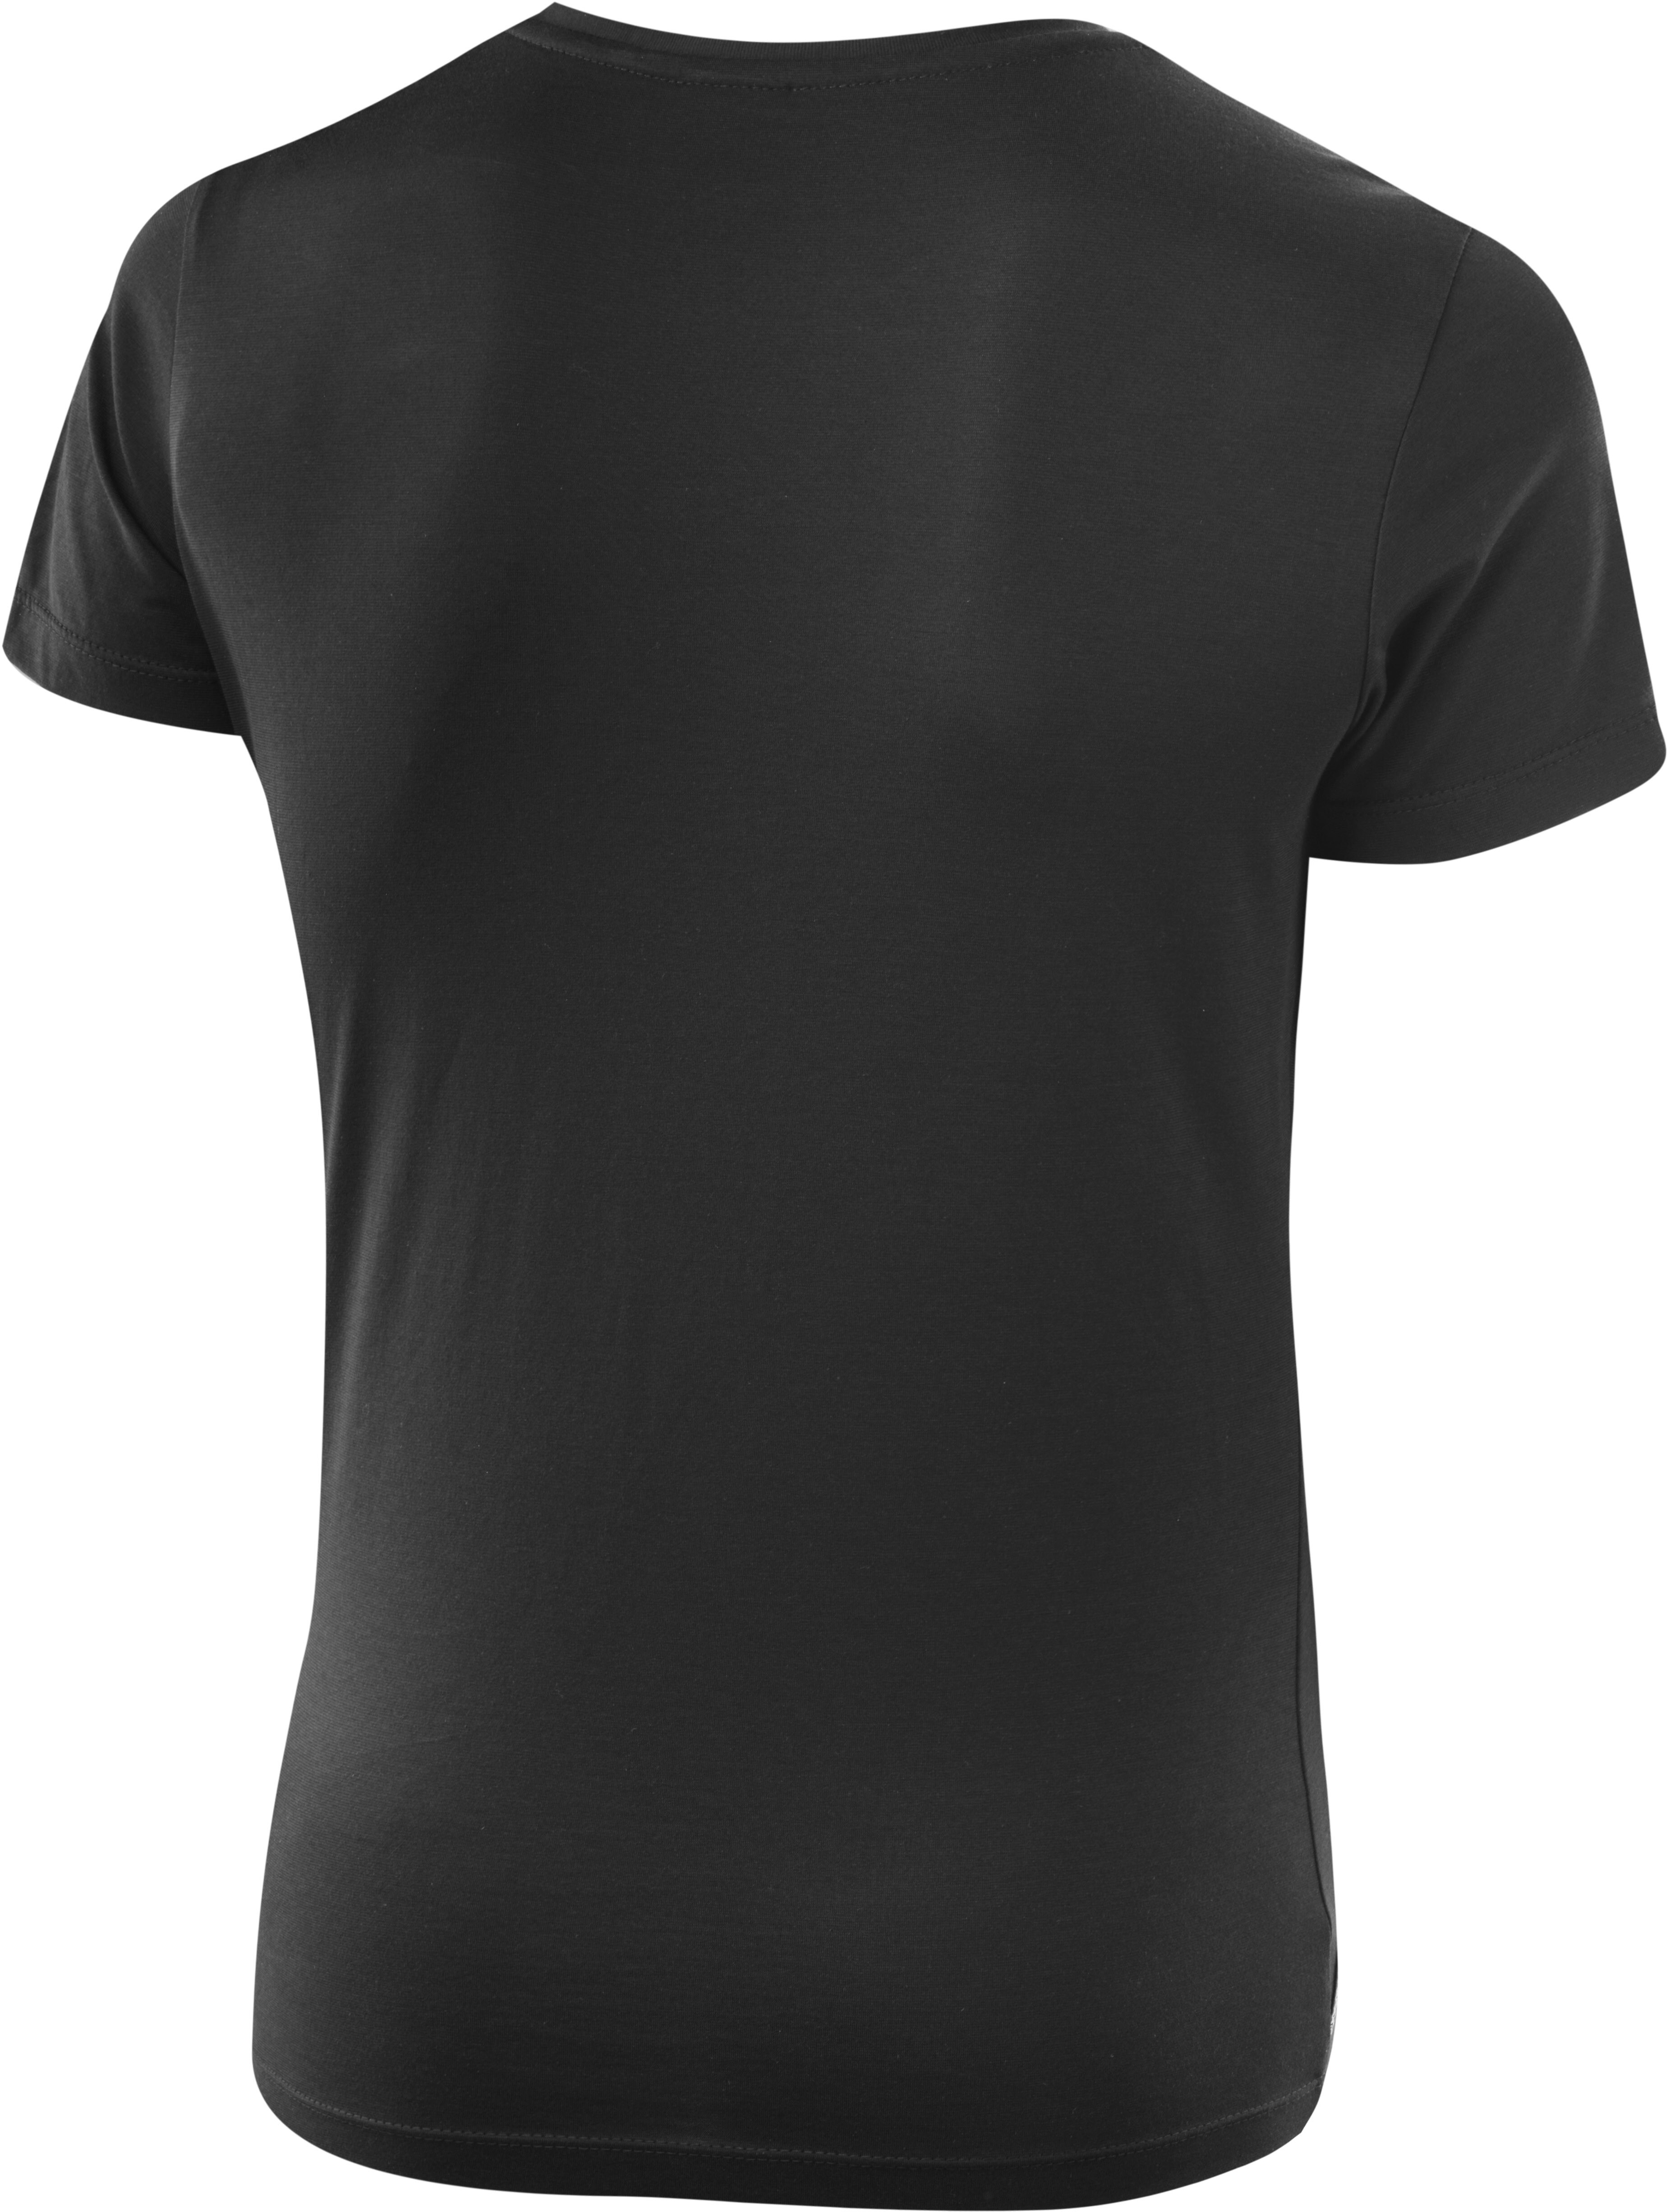 e0429b36c0f Löffler Transtex Single t-shirt Dames, black